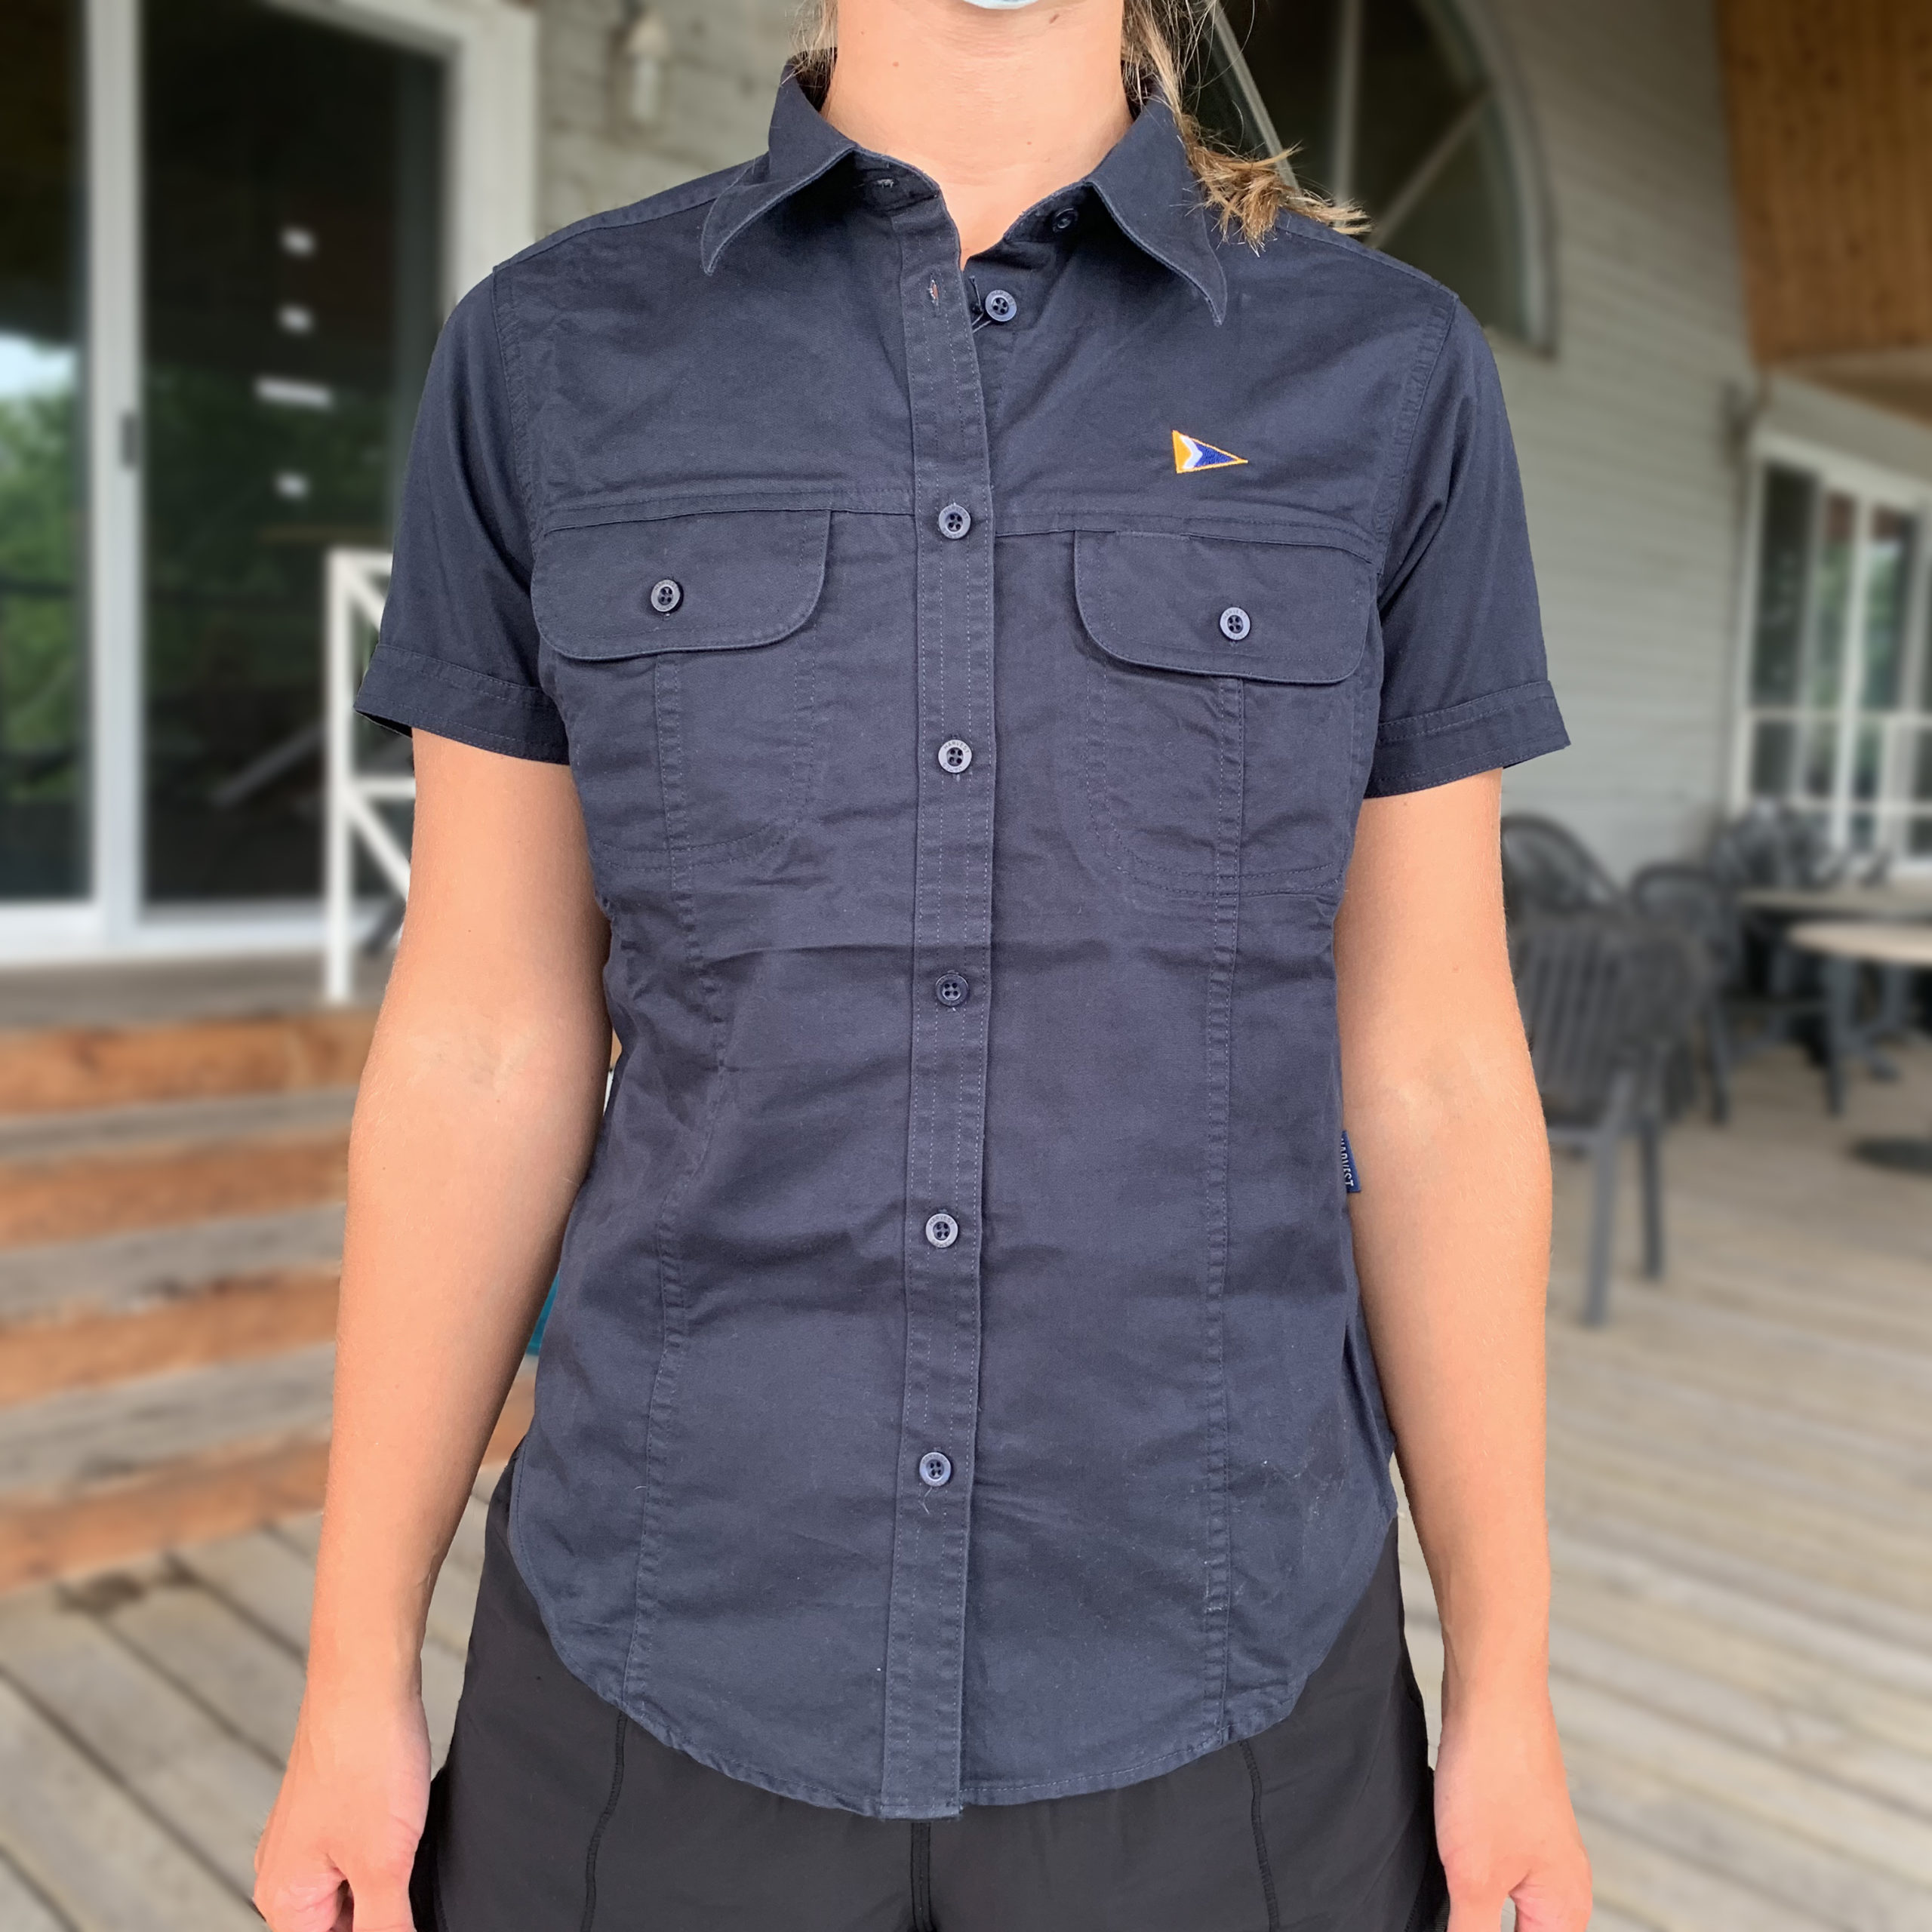 Ladies' Twill Shirt, Navy - $30